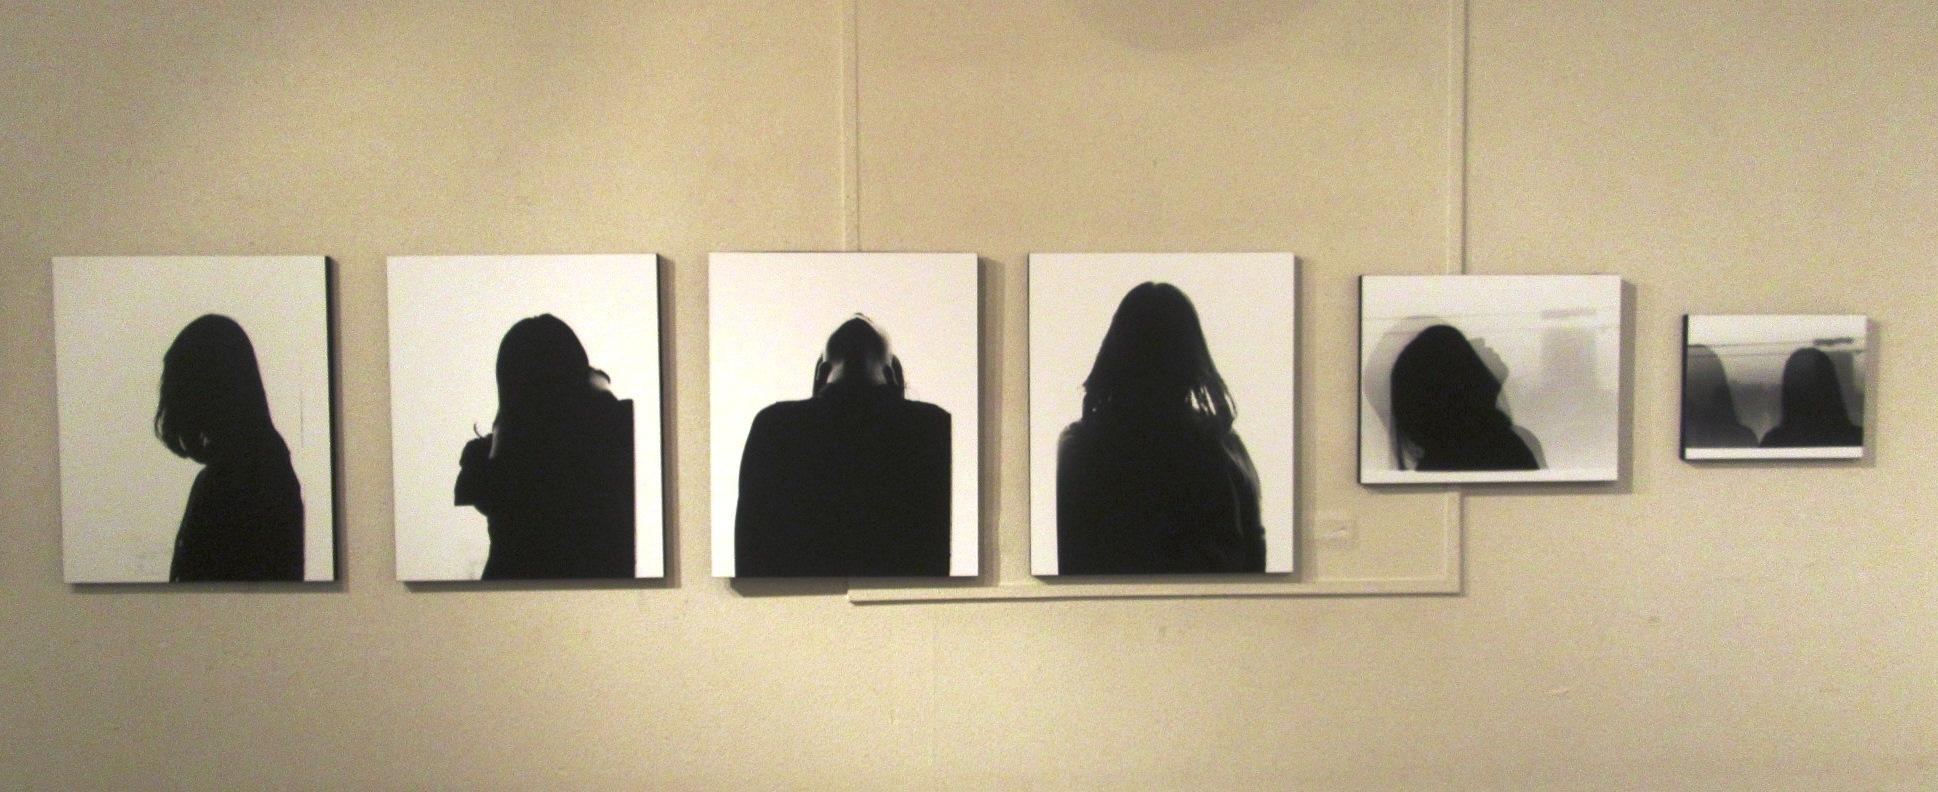 2569)②「『moment』 篠原 奈那子(藤女子大学4年)写真展」 アートスペース201 8月3日(木)~8月7日(火)_f0126829_11130659.jpg